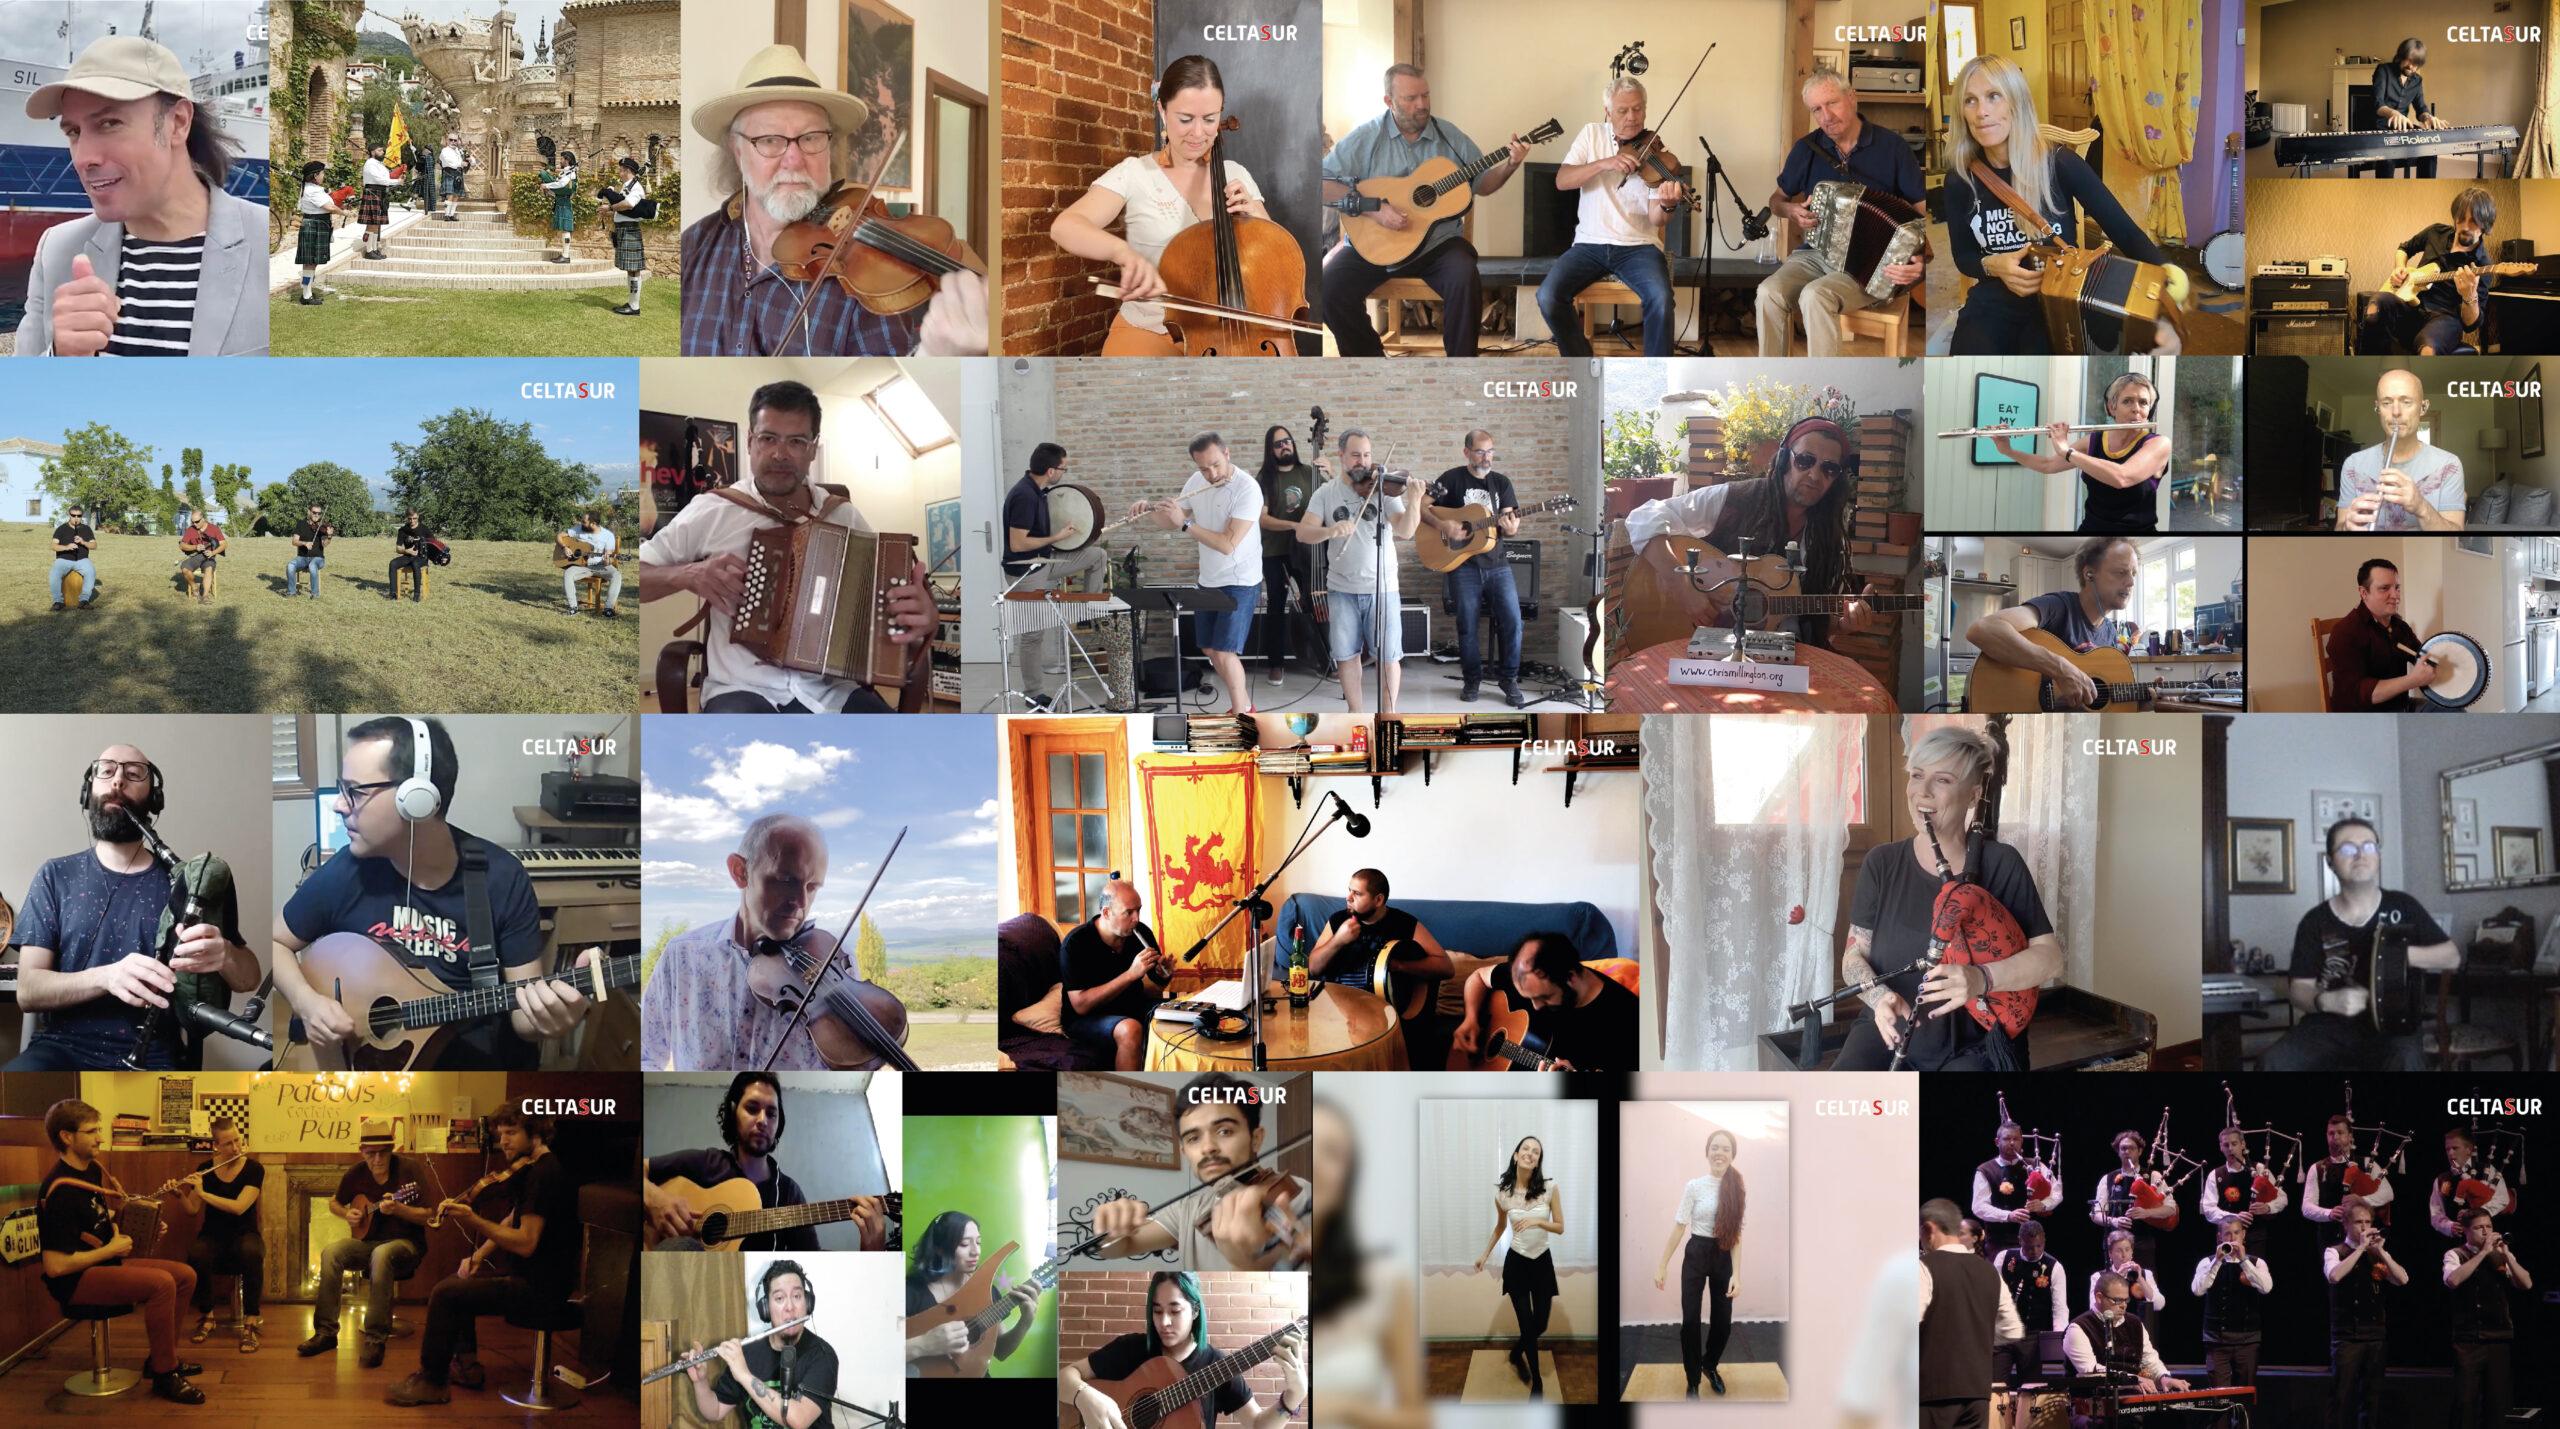 La exitosa edición virtual del Festival CELTASUR consigue atraer a más de 3.000 espectadores colocando a Cúllar Vega como un referente de la música celta internacional.